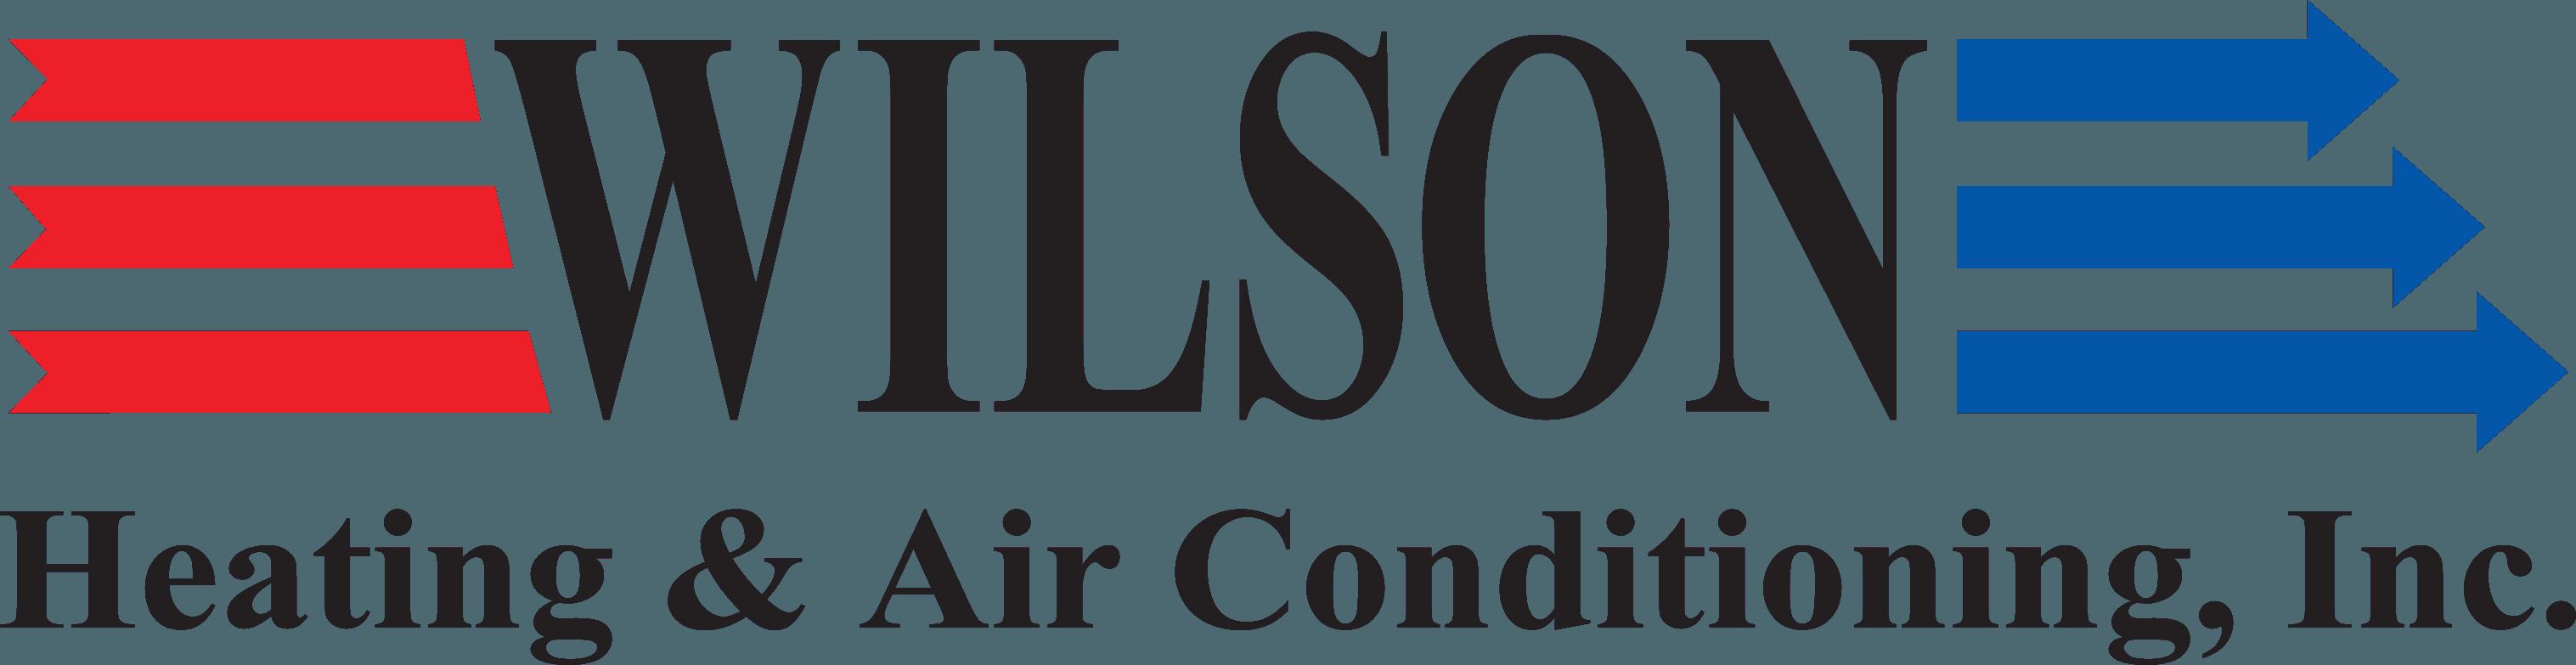 Wilson Heating & Air Conditioning, Inc - Logo